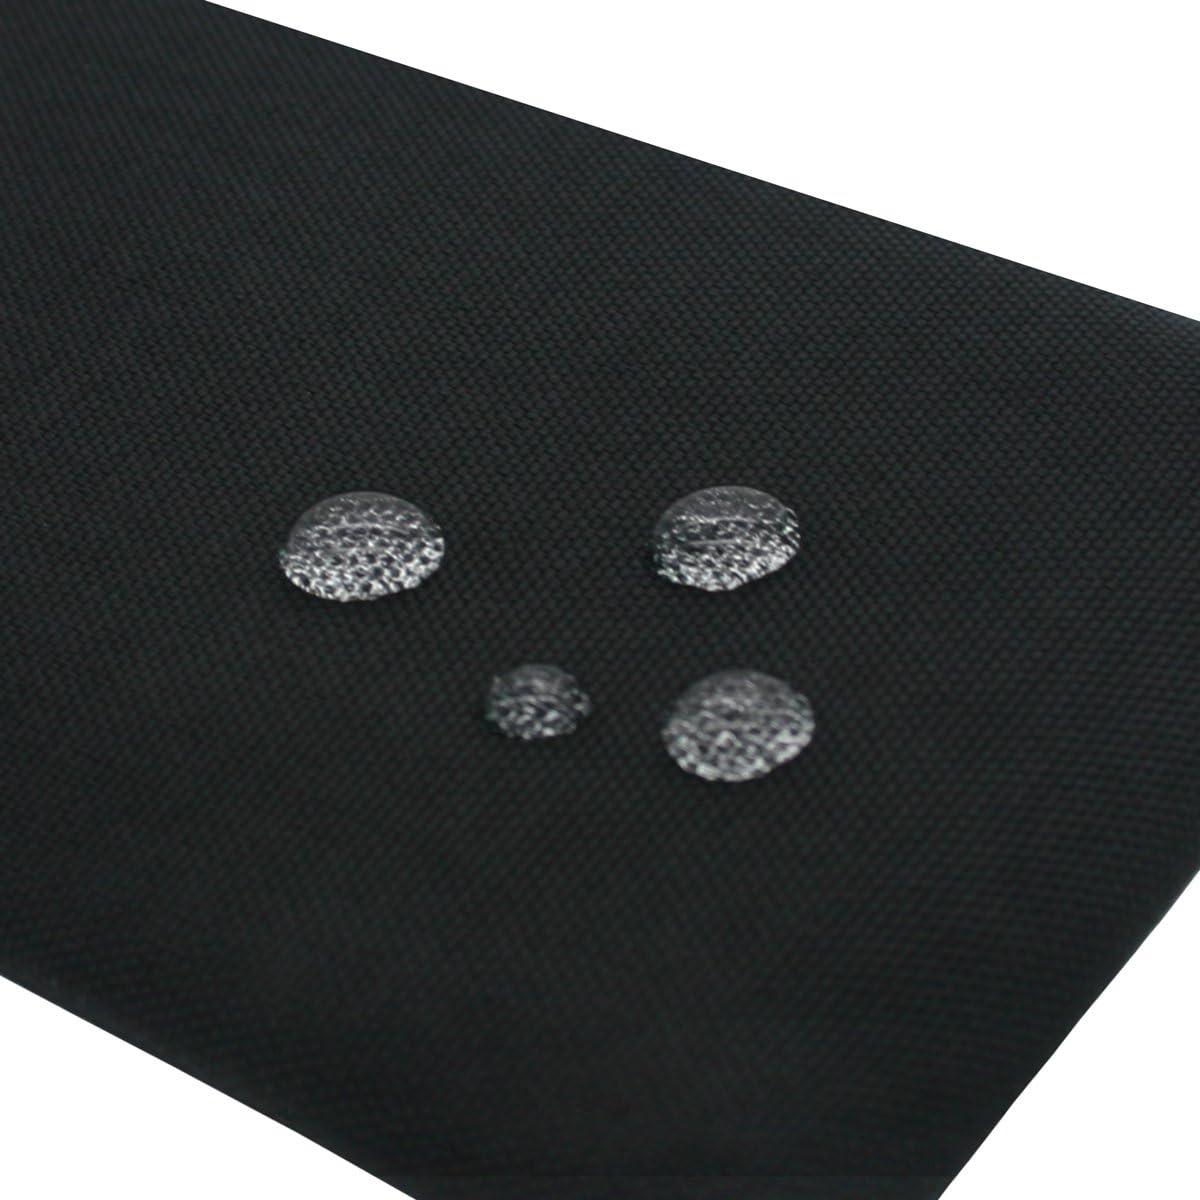 Adore June Classic Verde-Oliva Funda Compatible con iPhone 12 Pro MAX Material Resistente Efecto Limpiador de Pantalla